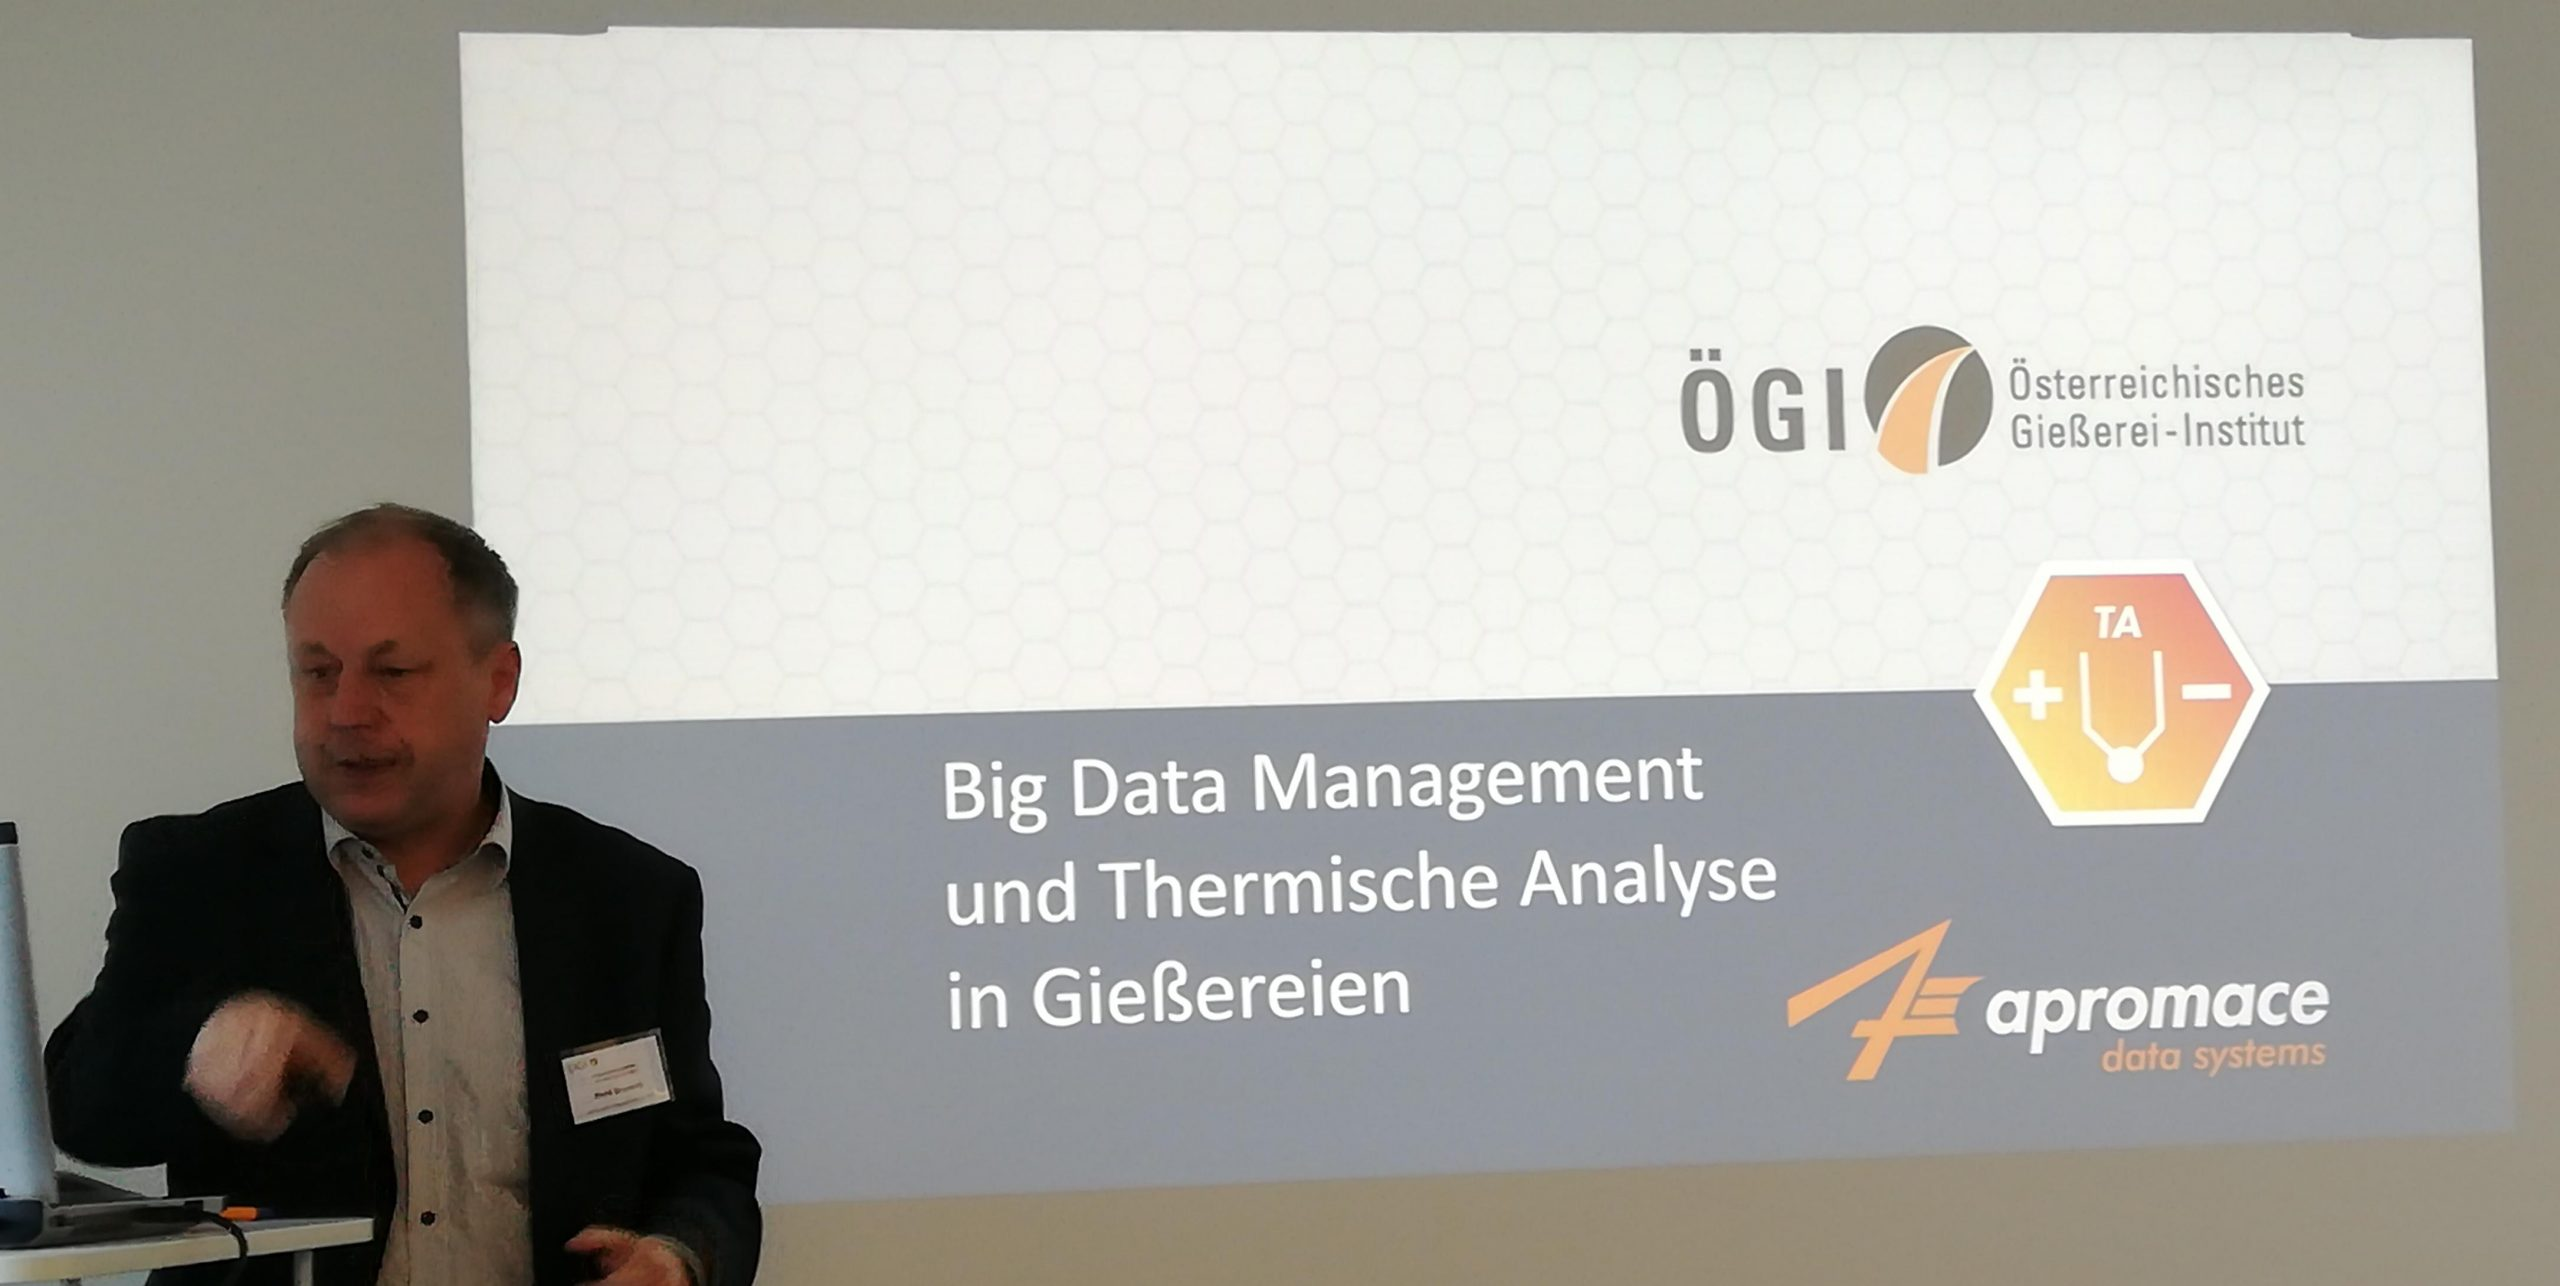 apromace-Vortrag am ÖGI in Leoben zum 2. innoUP-Projekttreffen (Foto: F. Hanzig | apromace data systems GmbH)